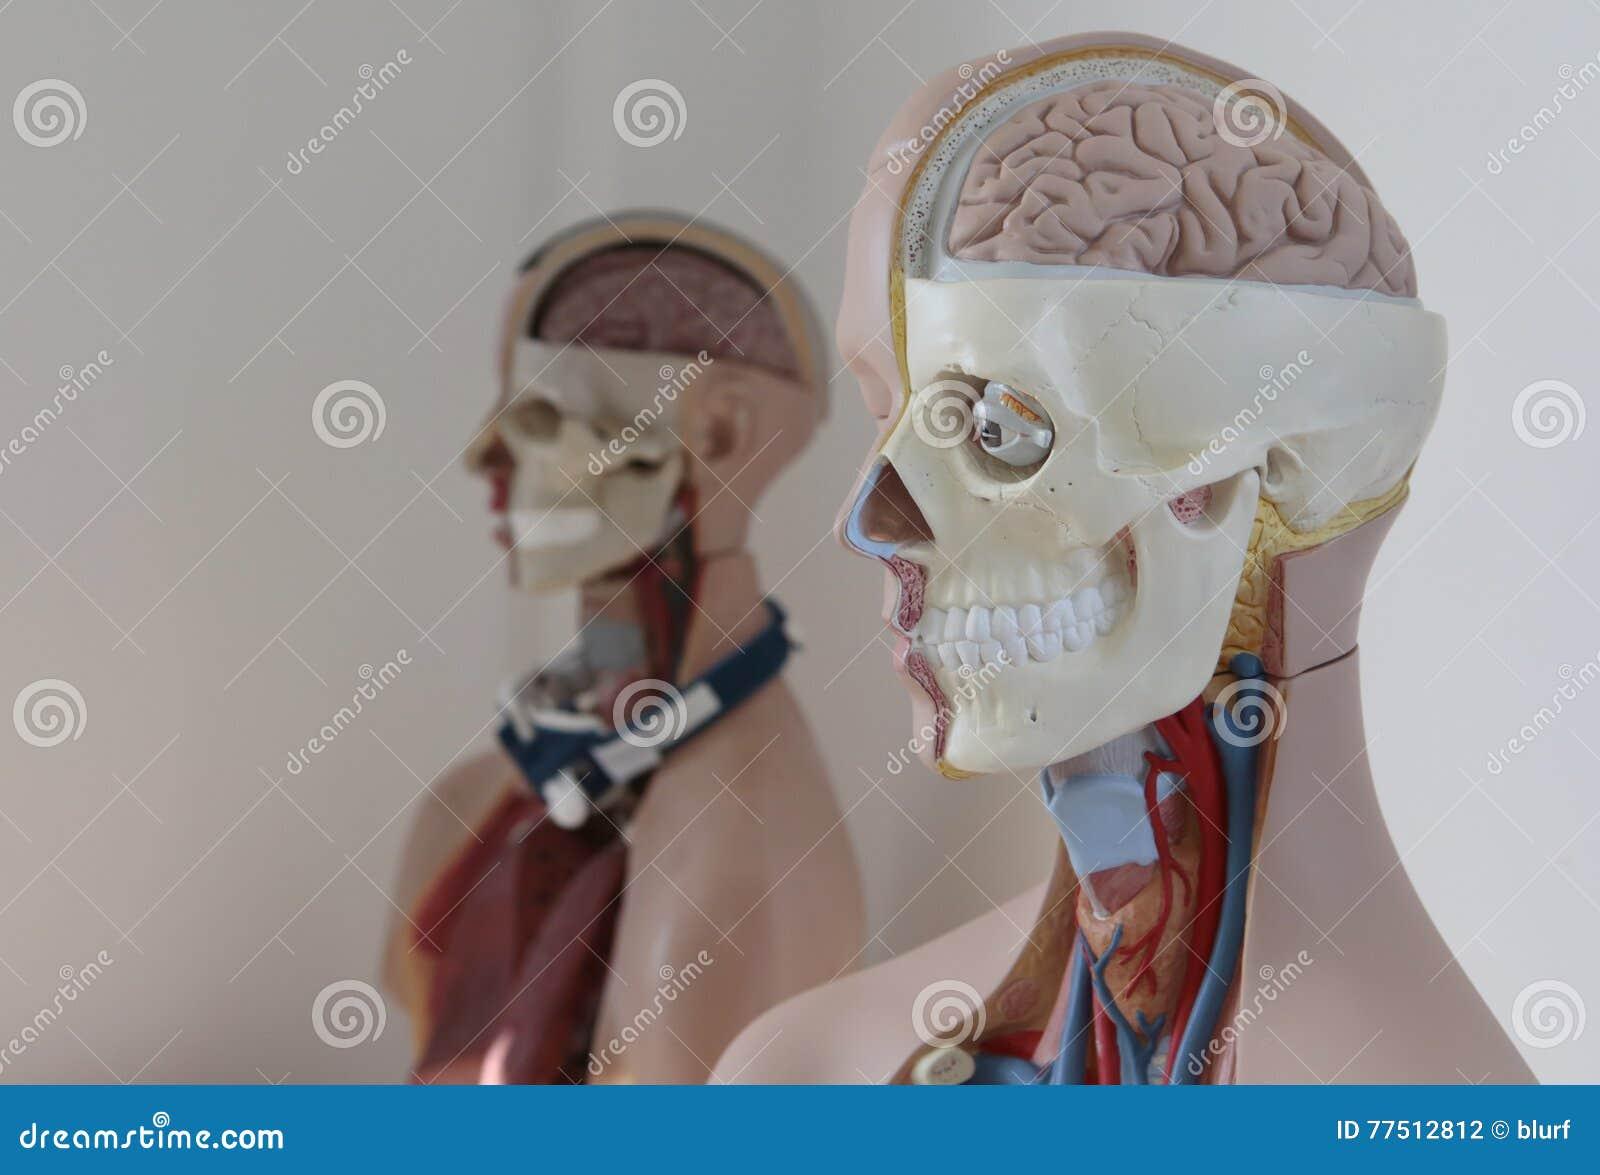 Anatomy dummy model stock photo. Image of skull, model - 77512812